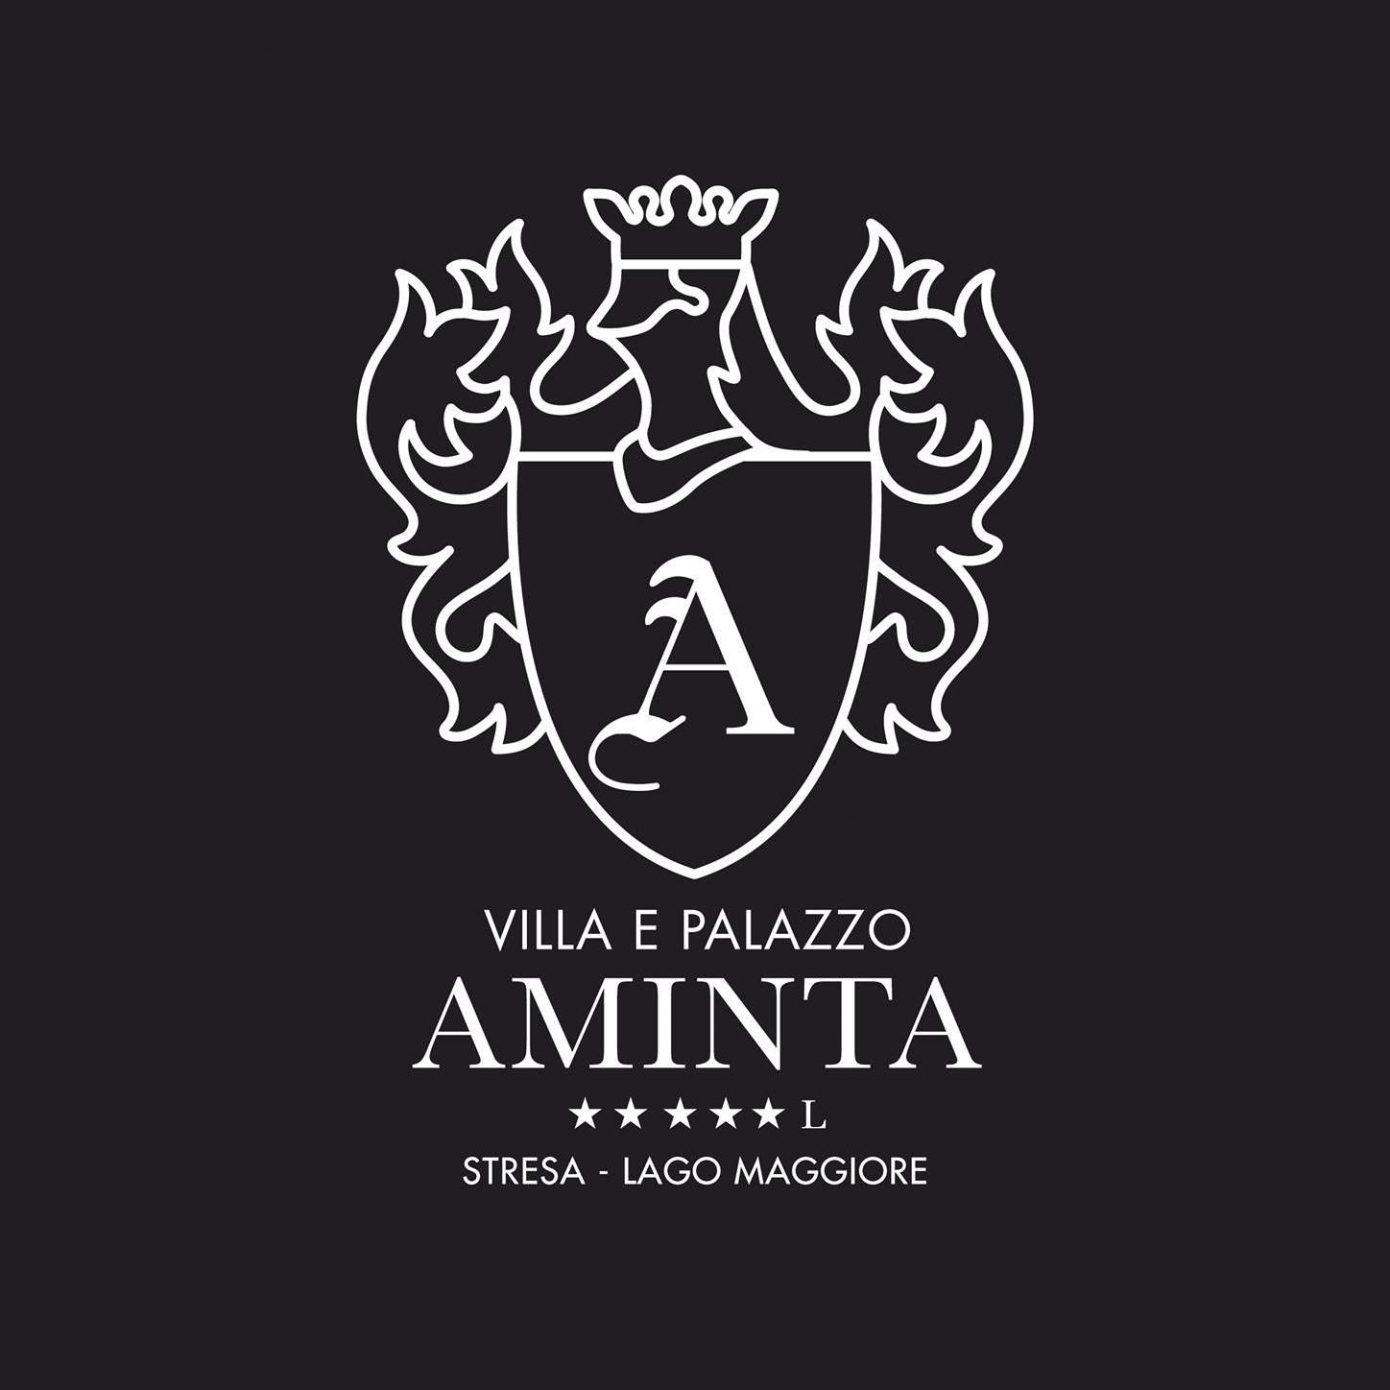 Web marketing fotografie Hotel Stresa Villa Aminta